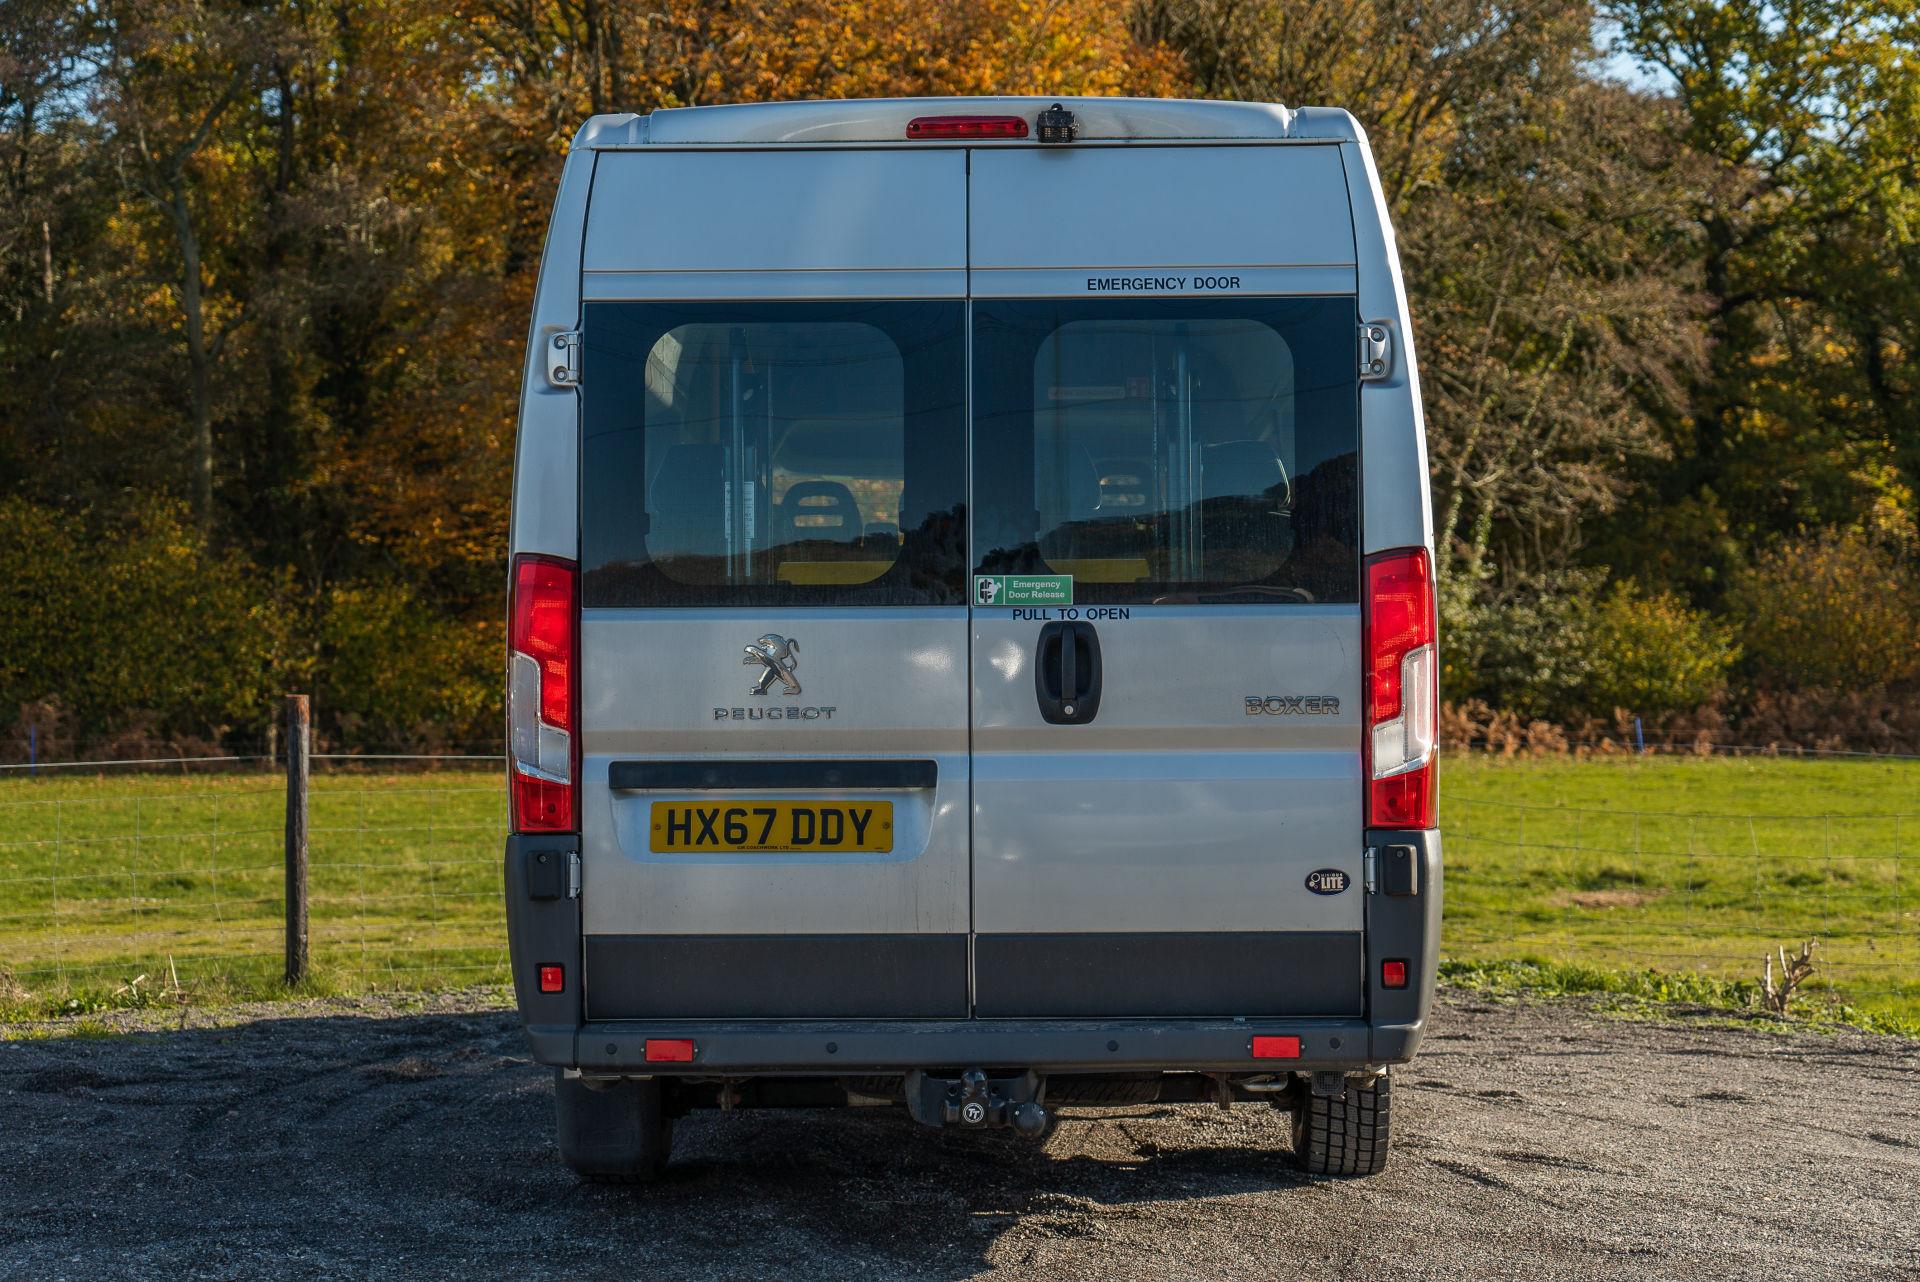 Peugeot Boxer 17 Seater Accessible Minibus for Sale - Image 8